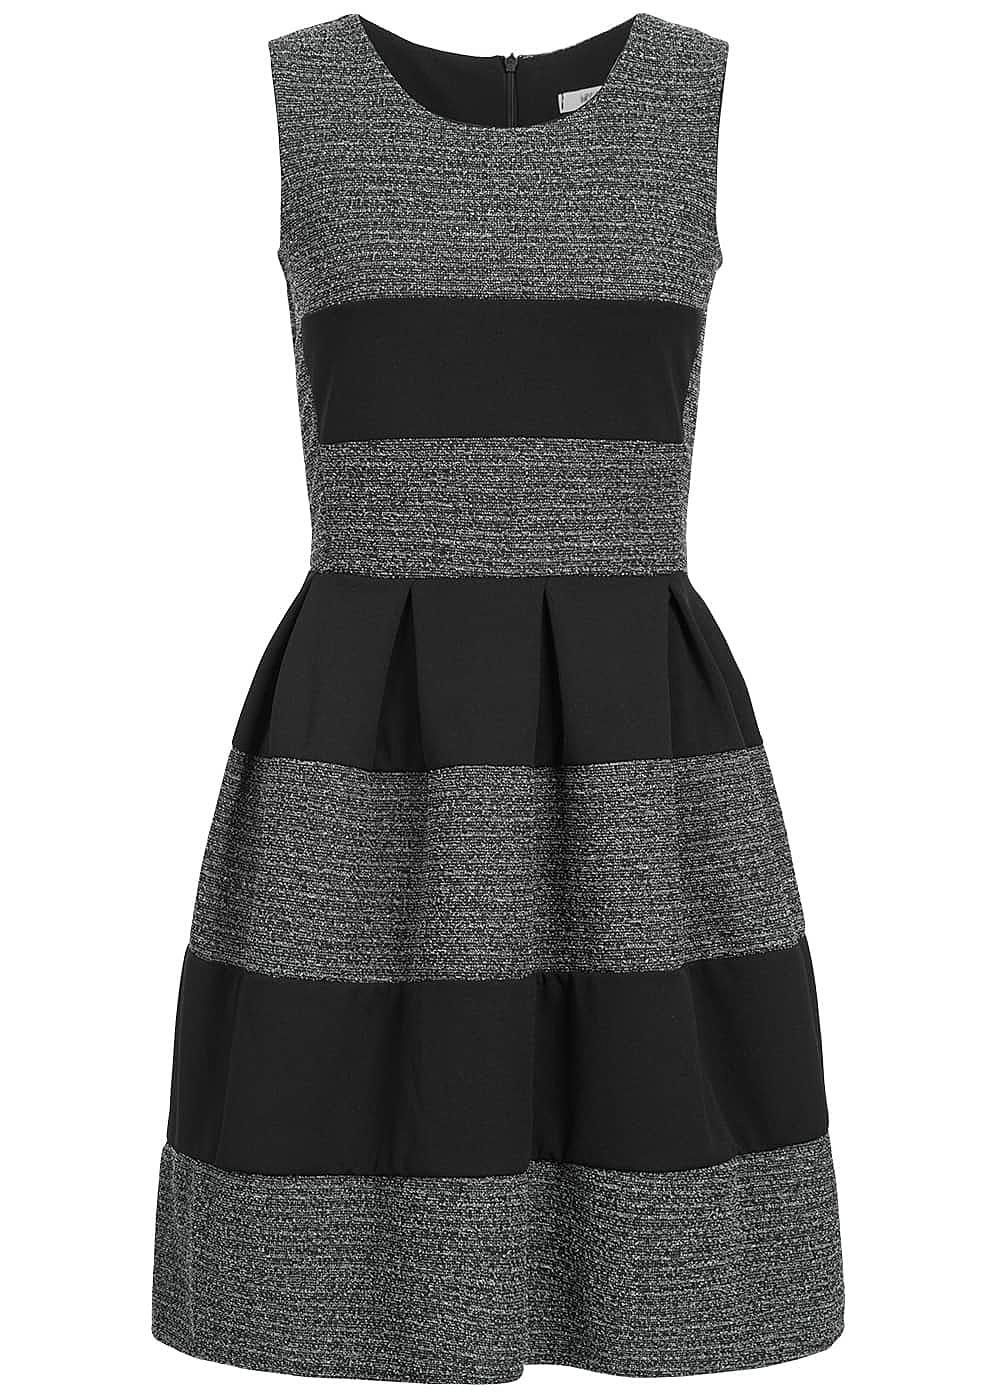 hailys damen mini kleid gestreift dunkel grau schwarz 77onlineshop. Black Bedroom Furniture Sets. Home Design Ideas